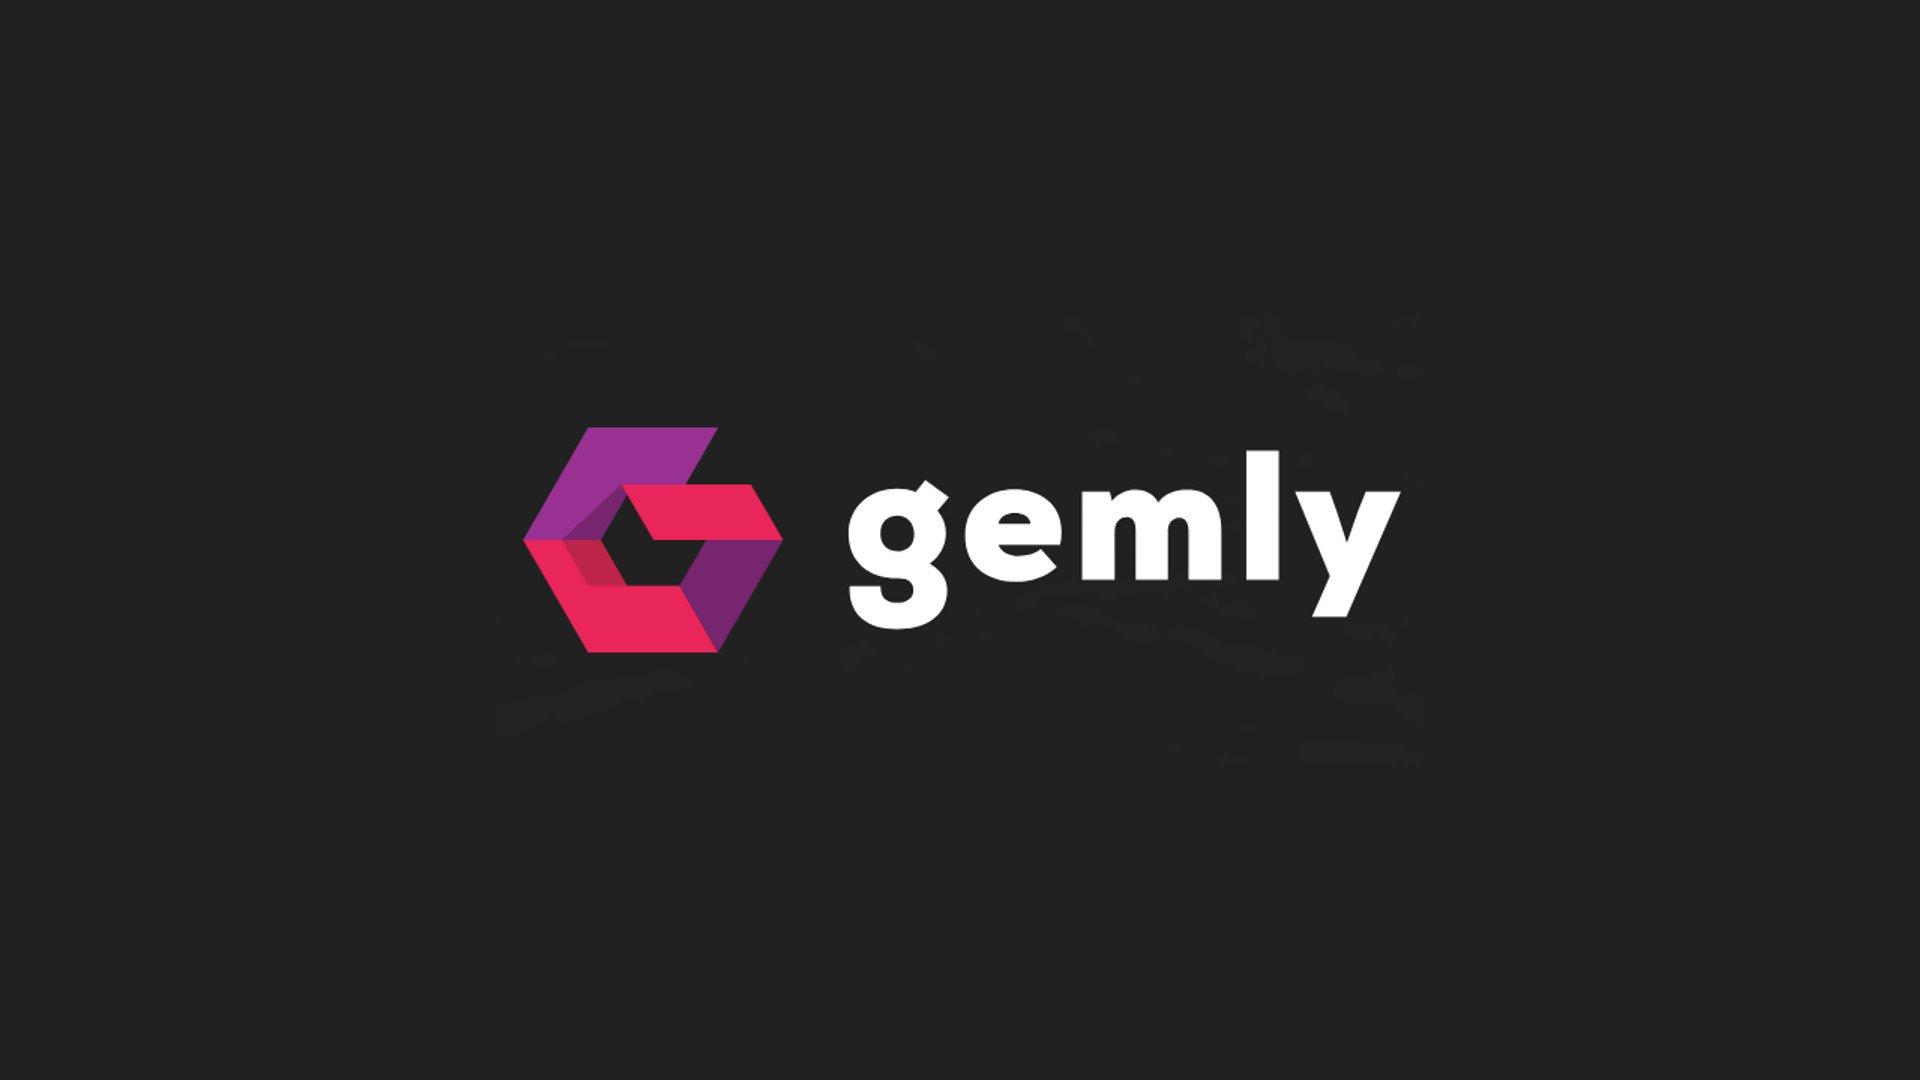 Gemly